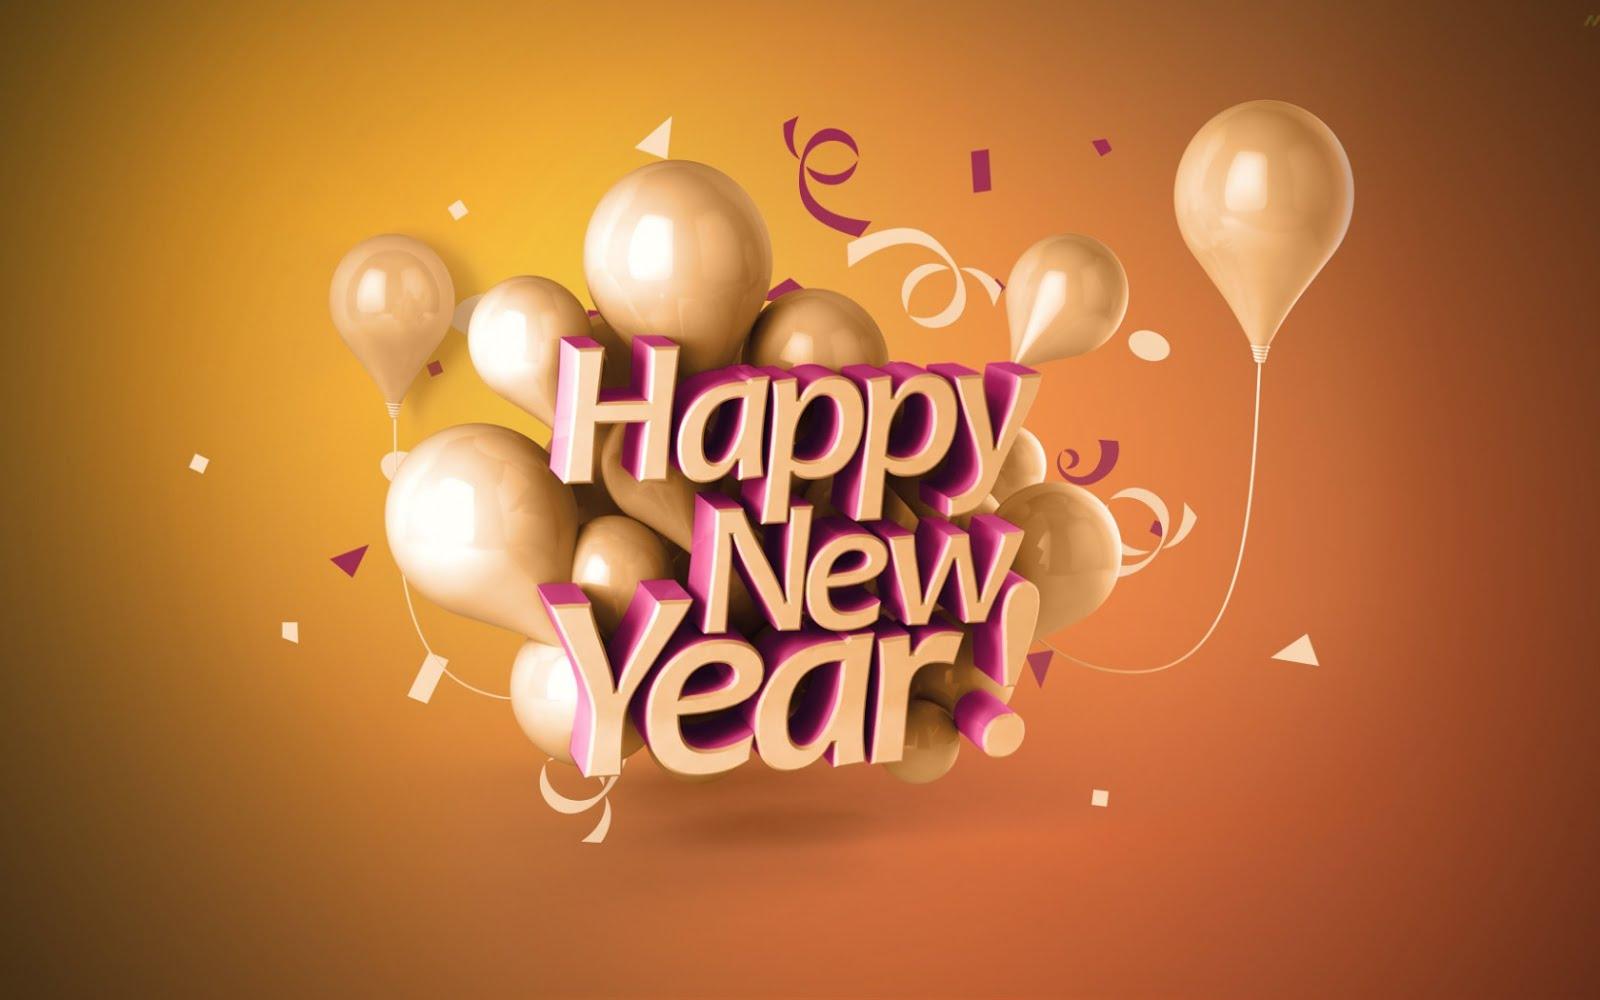 Wallpaper download karne ka app - Happy New Year 2017 Balloon Images